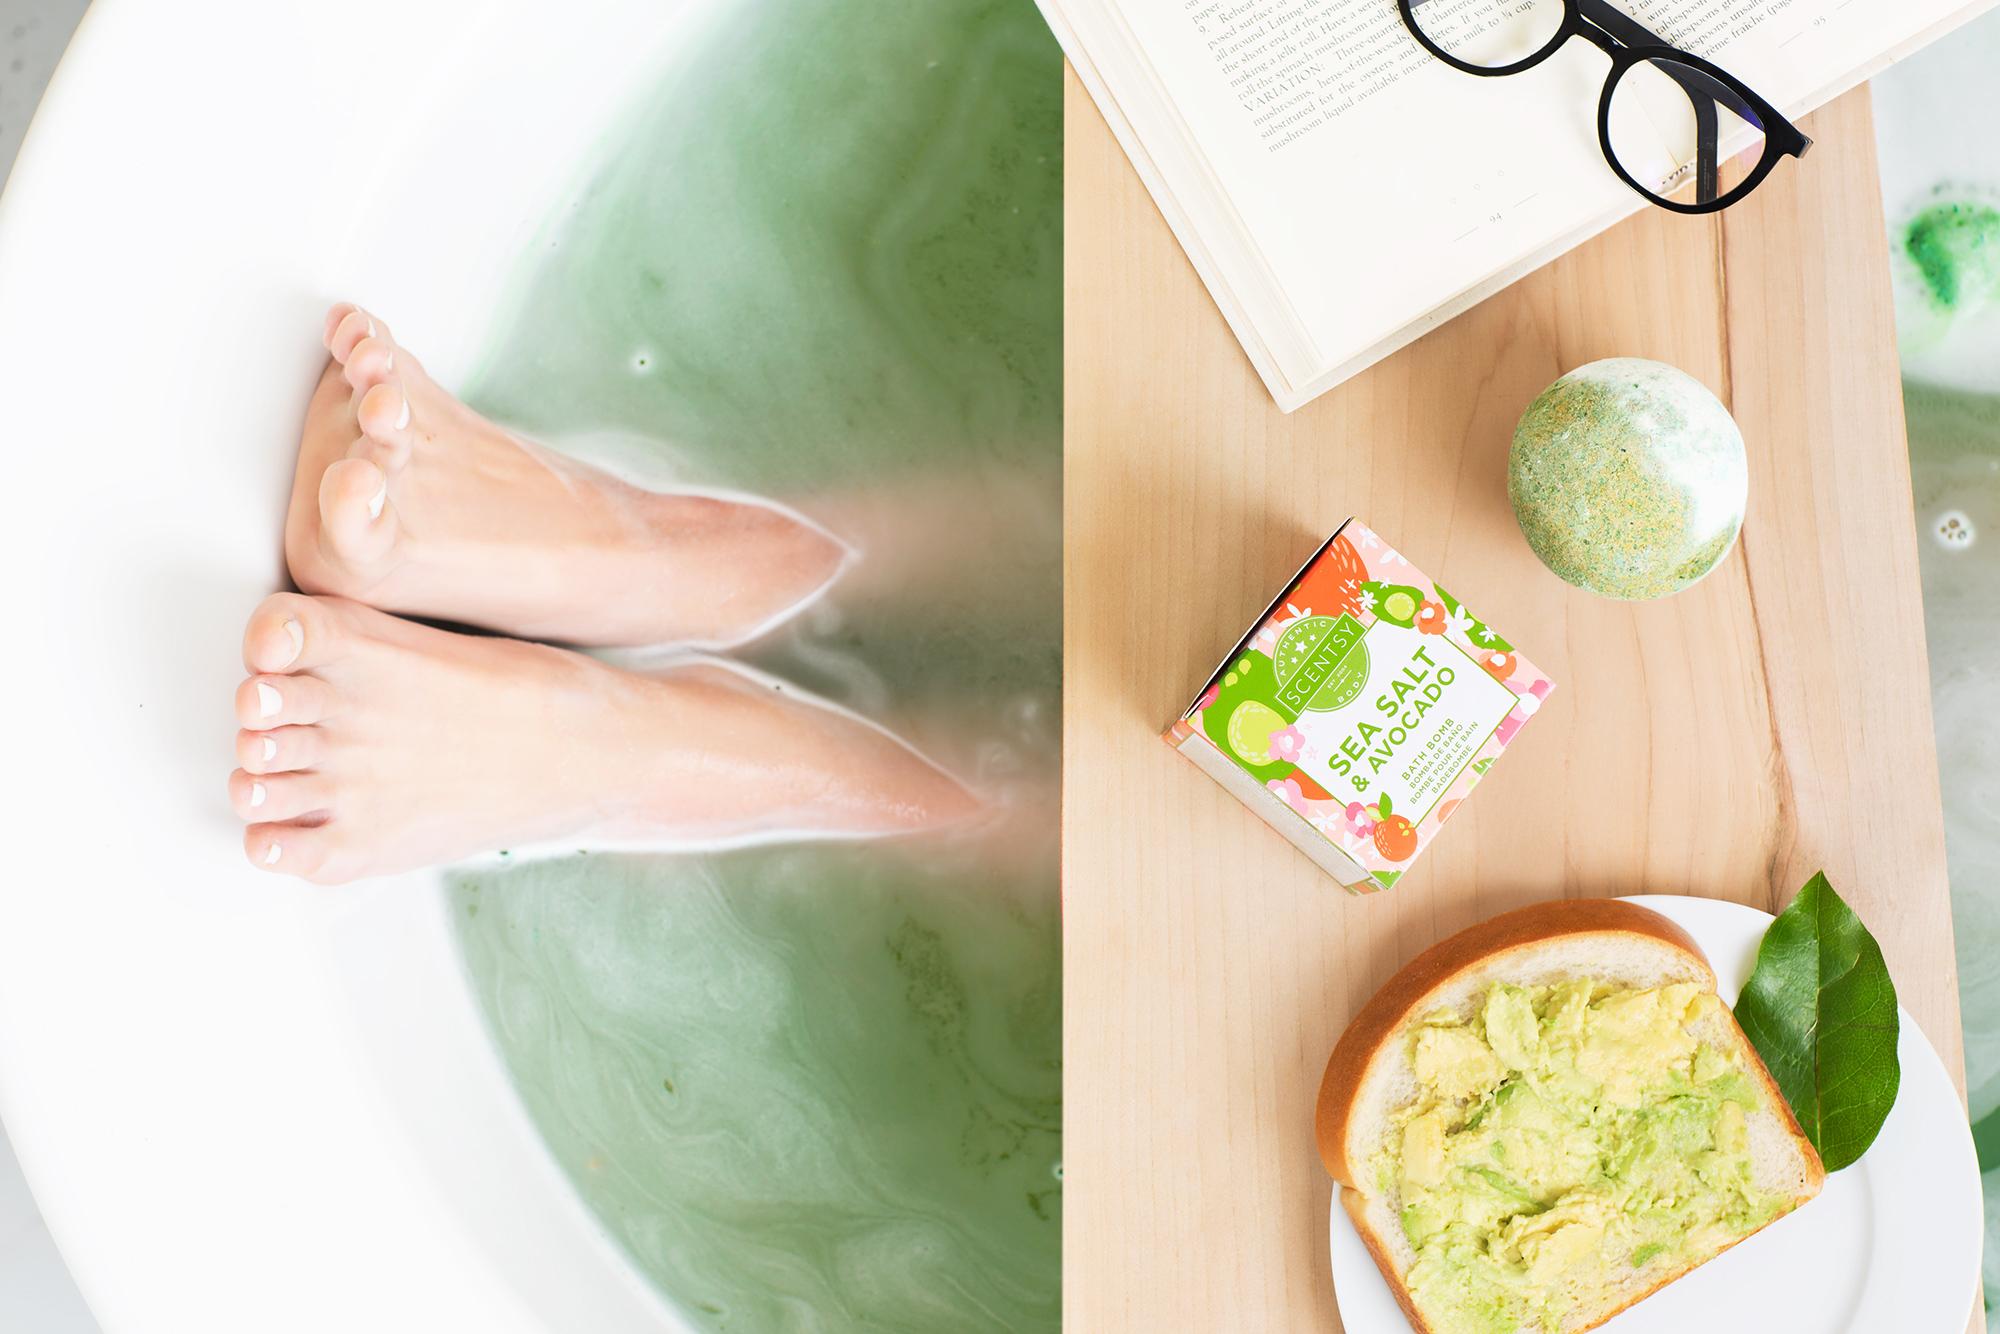 Photo of woman's feet soaking in a Scenty sea salt and avocado bath bomb bath